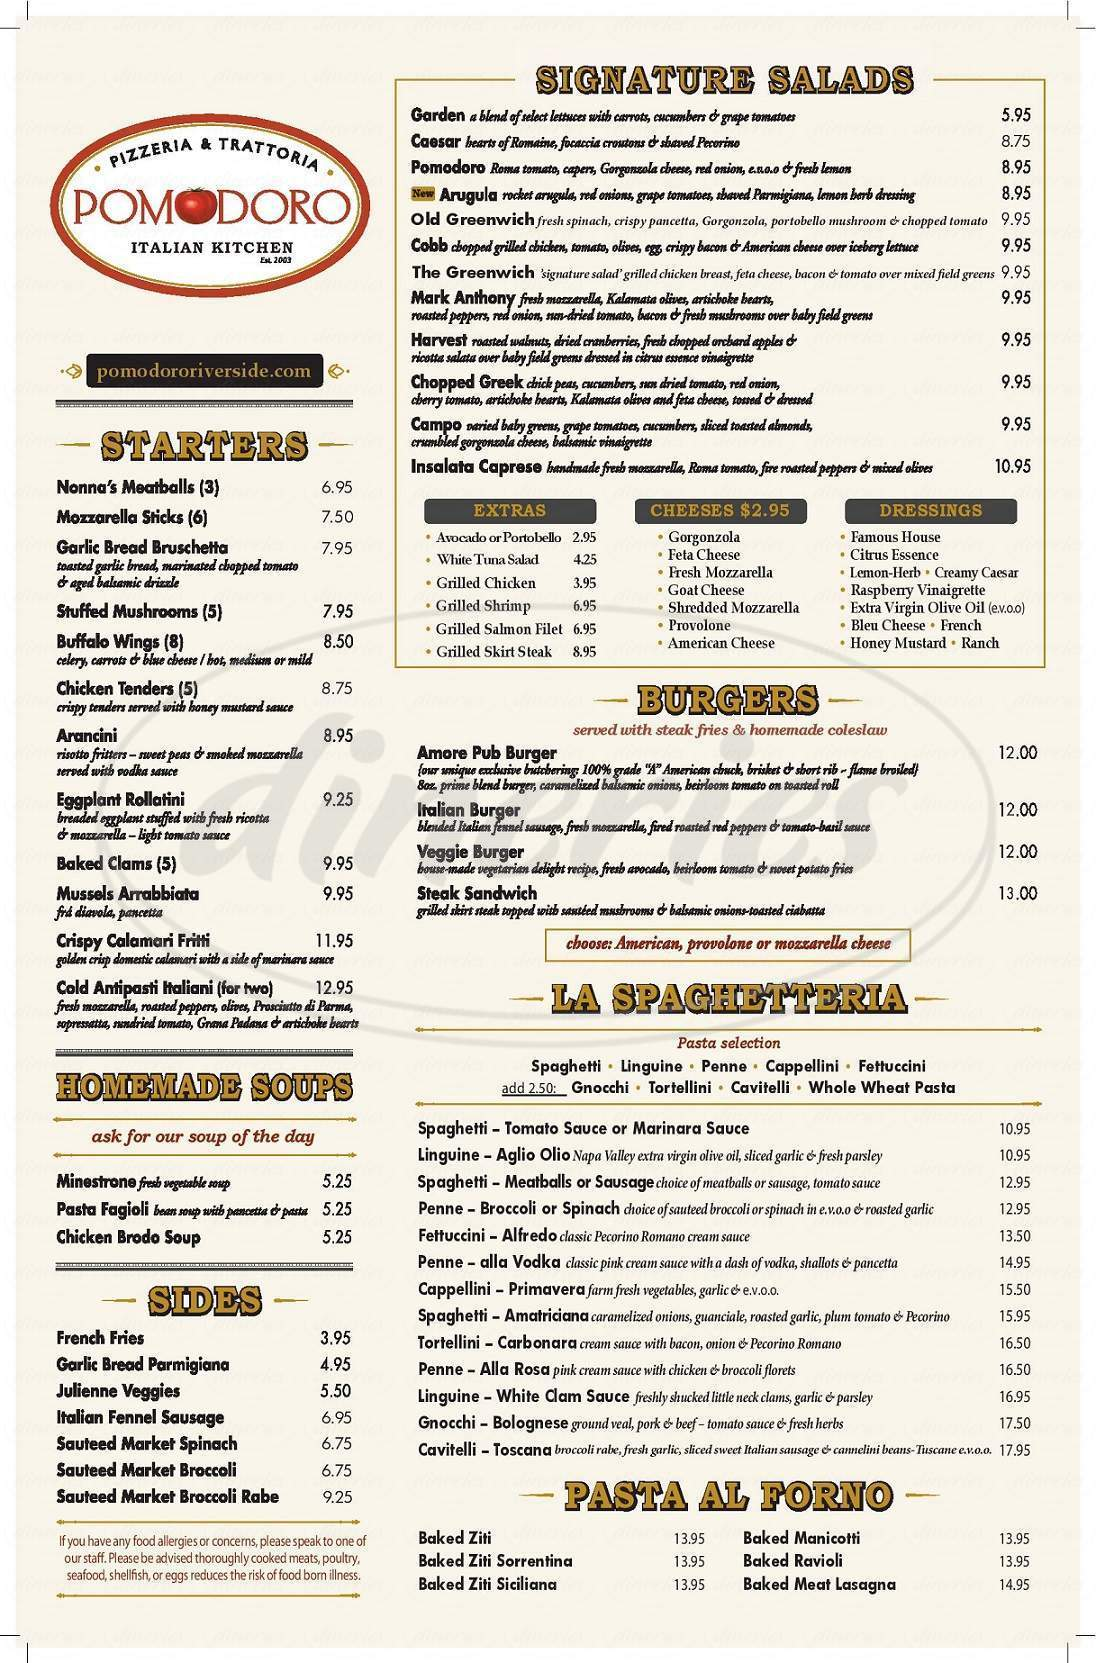 menu for Pomodoro